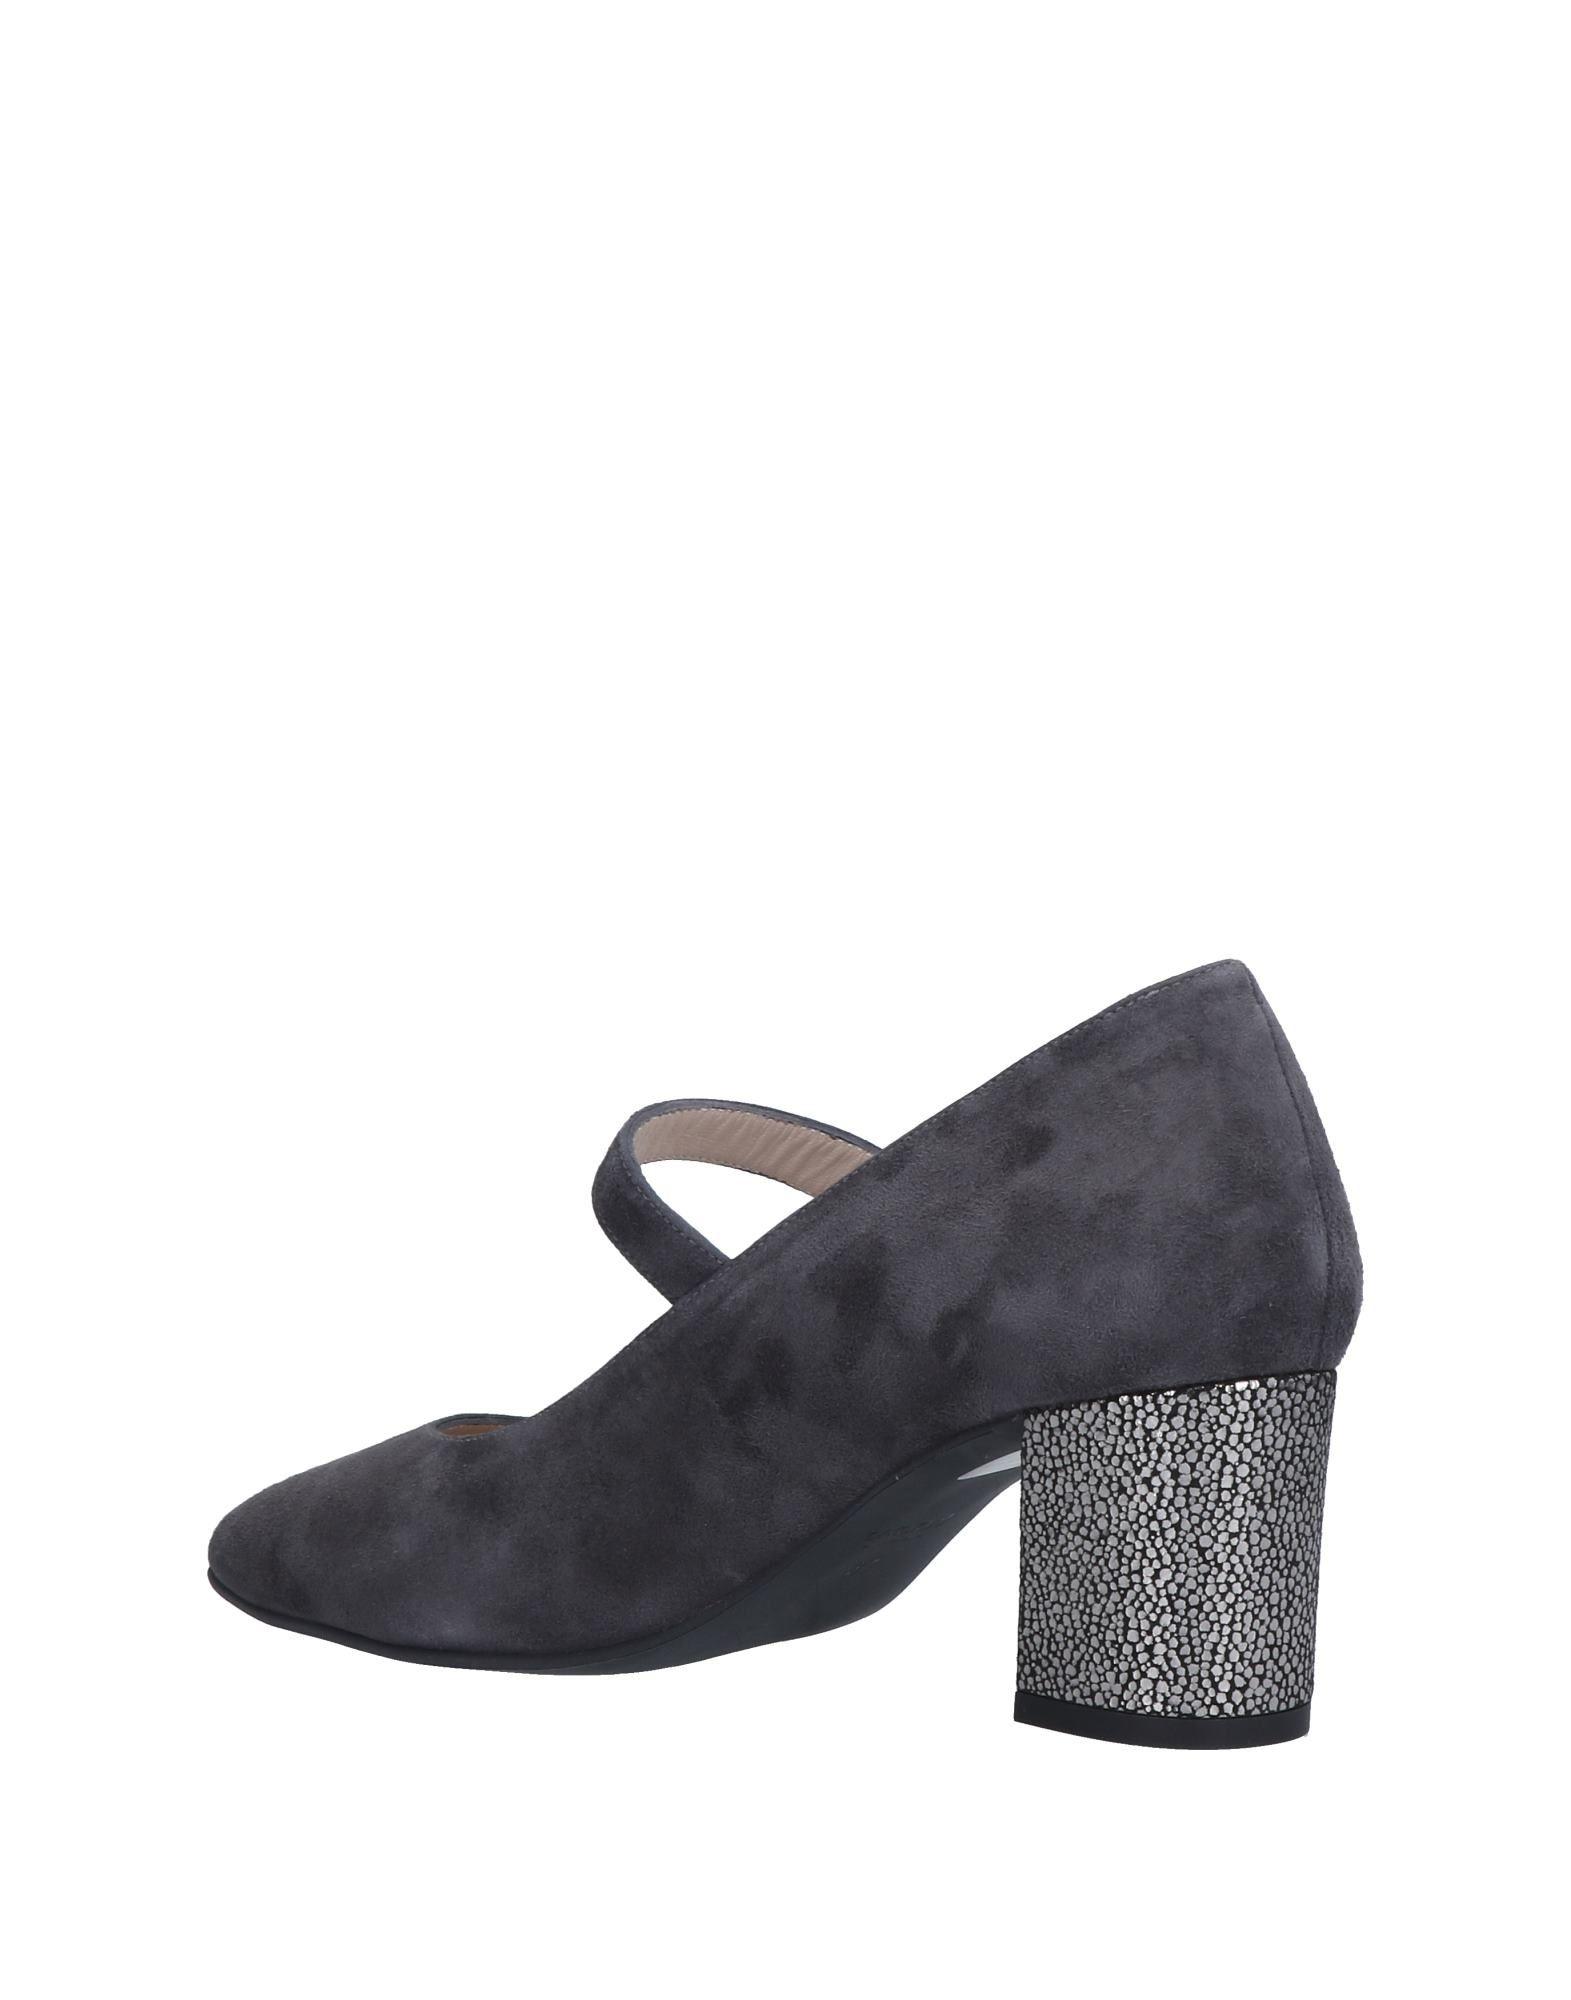 Stilvolle billige Schuhe Schuhe Schuhe Ancarani Pumps Damen  11515587HU 40caa0